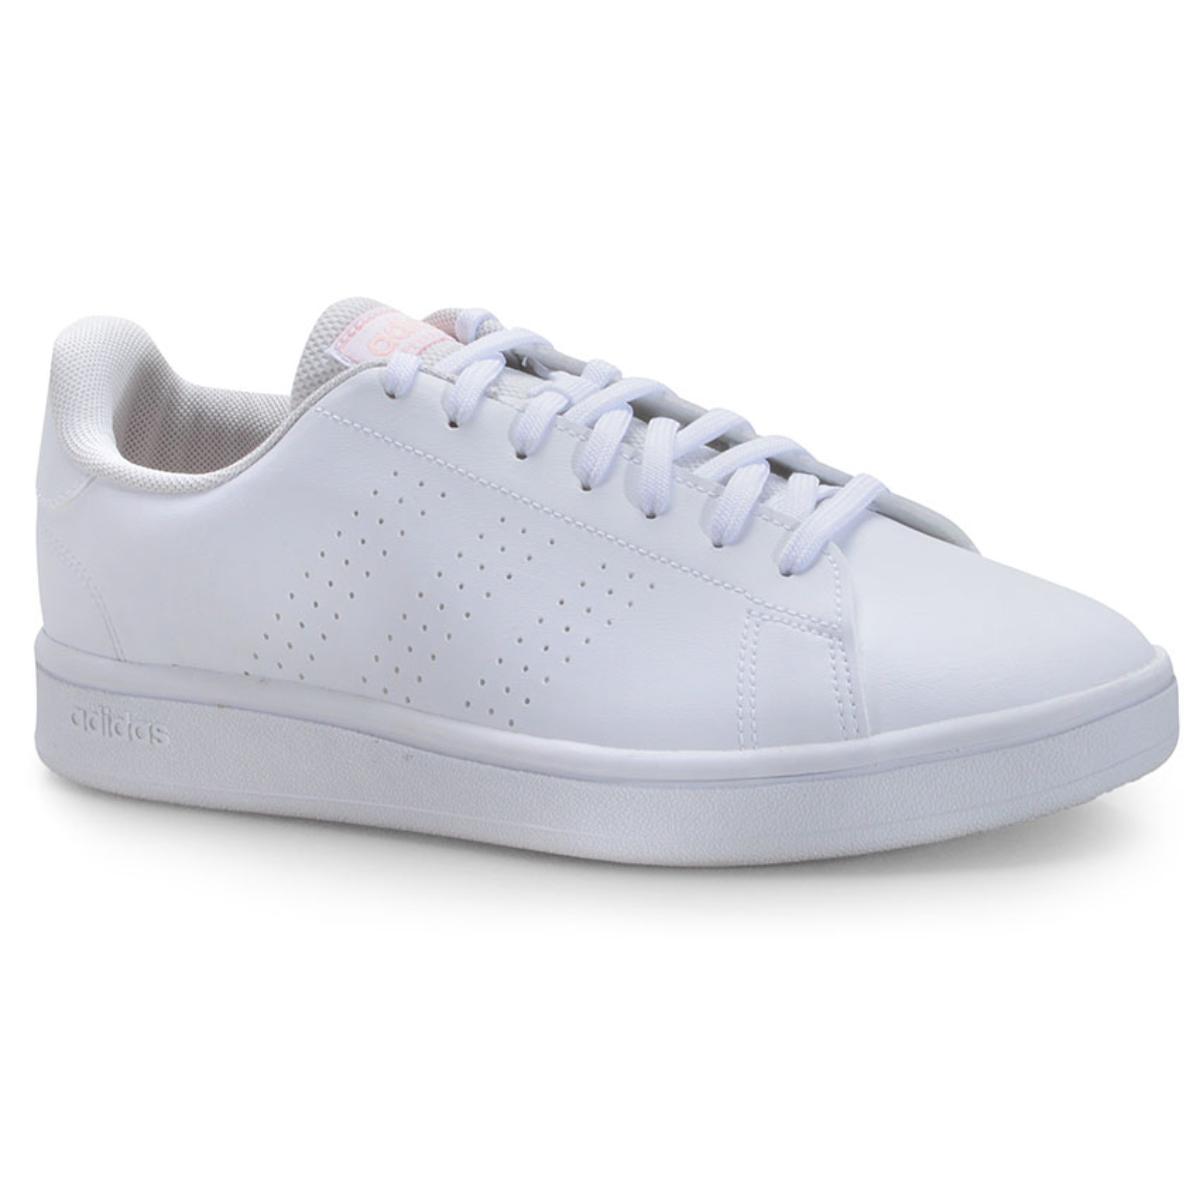 Tênis Feminino Adidas Ee7510 Advantage Base Branco